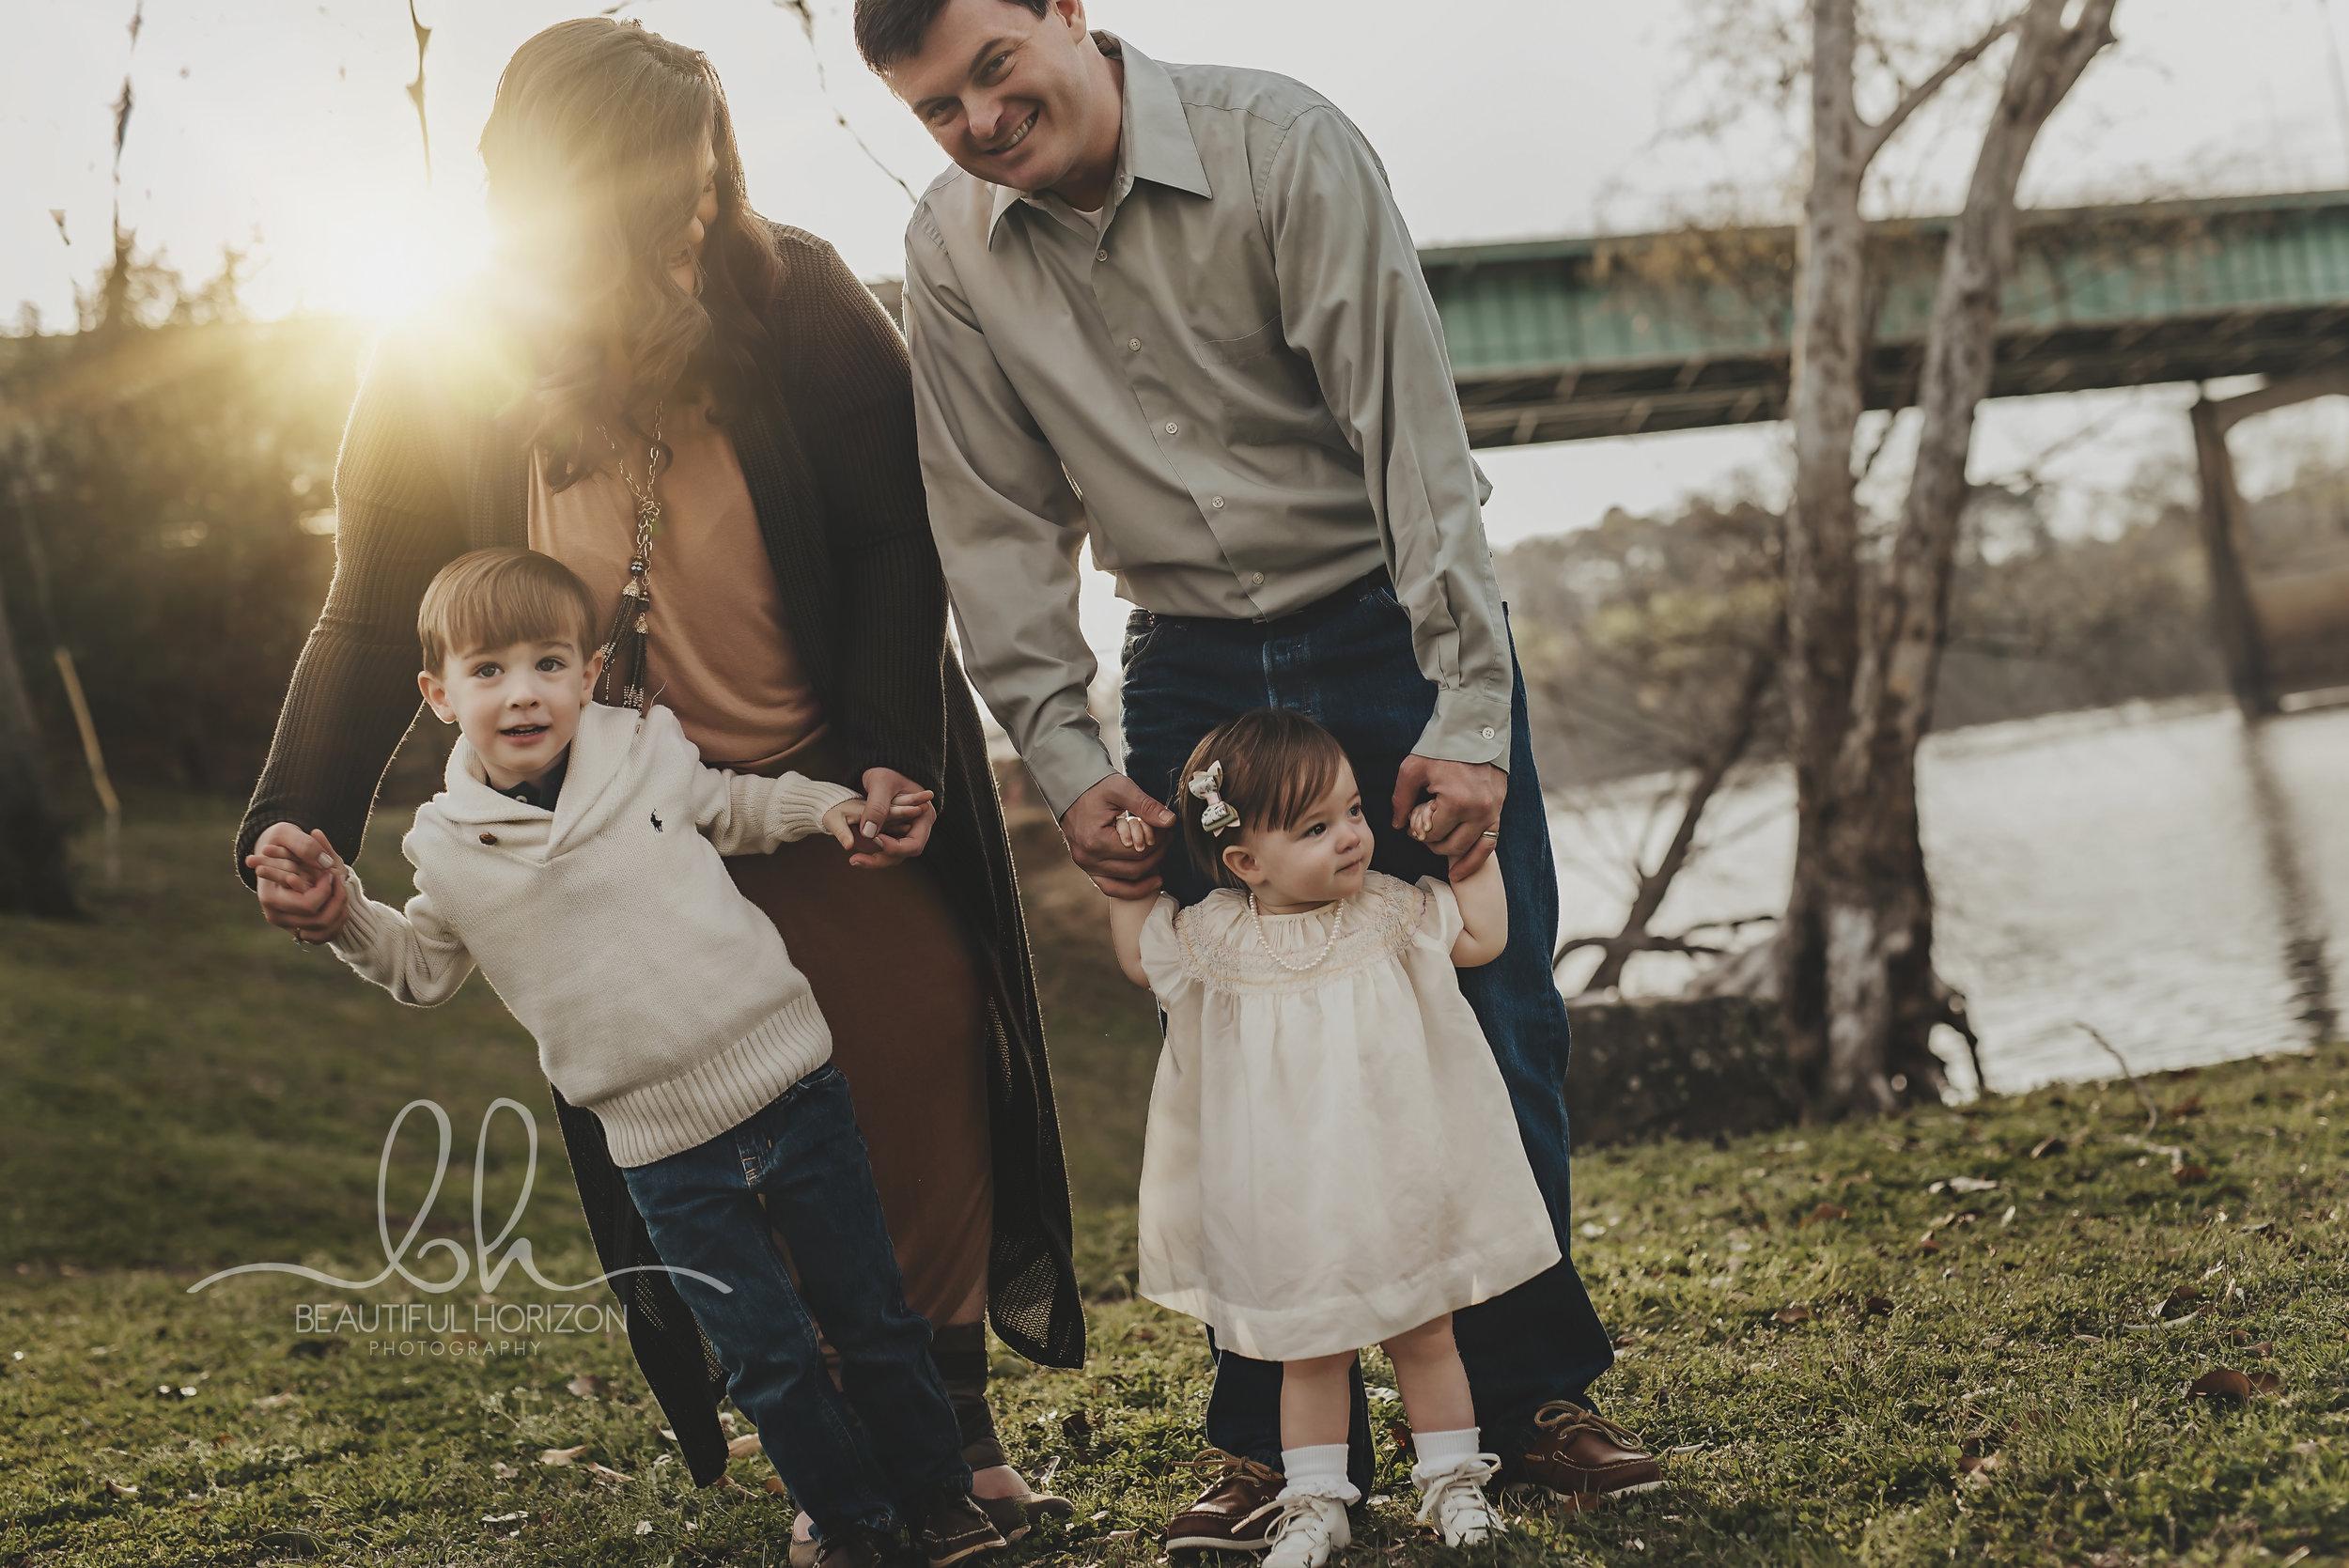 © Beautiful Horizon Photography . Tuscaloosa Family Photography. Portrait Photographer. Lifestyle Portrait Photographer in Tuscaloosa, Birmingham, Alabama.